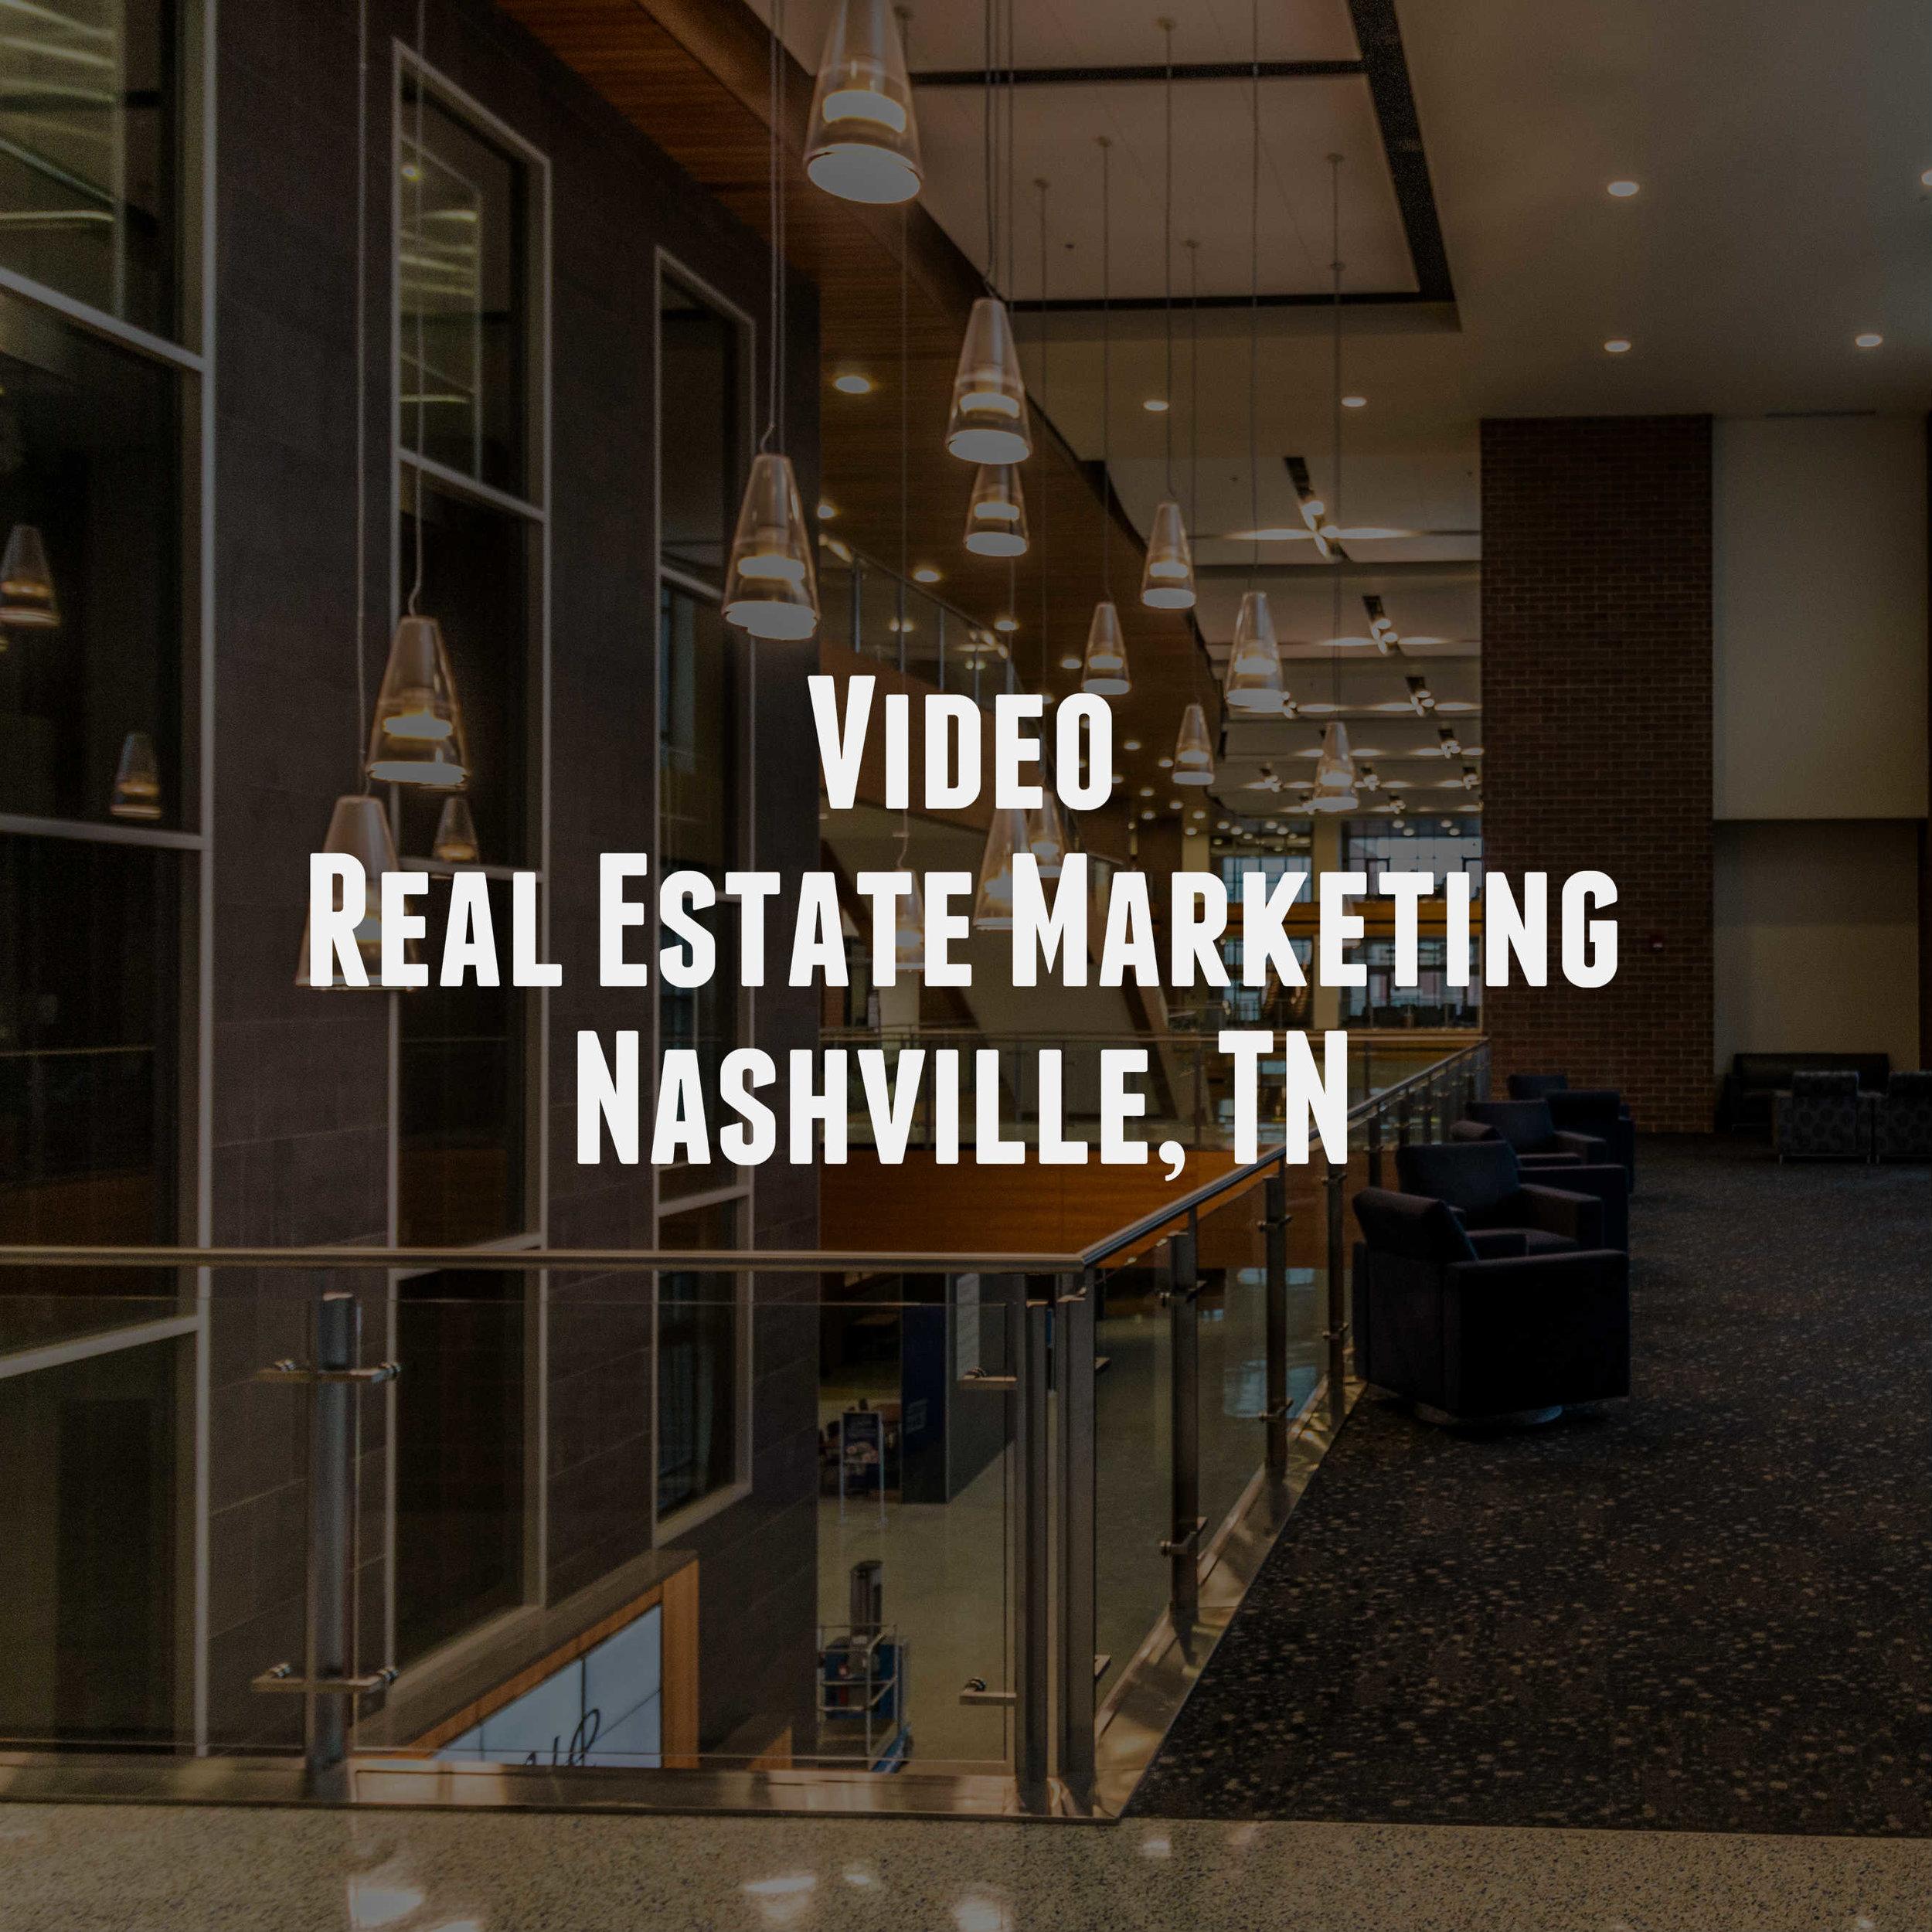 Video Real Estate Marketing in Nashville, TN Market